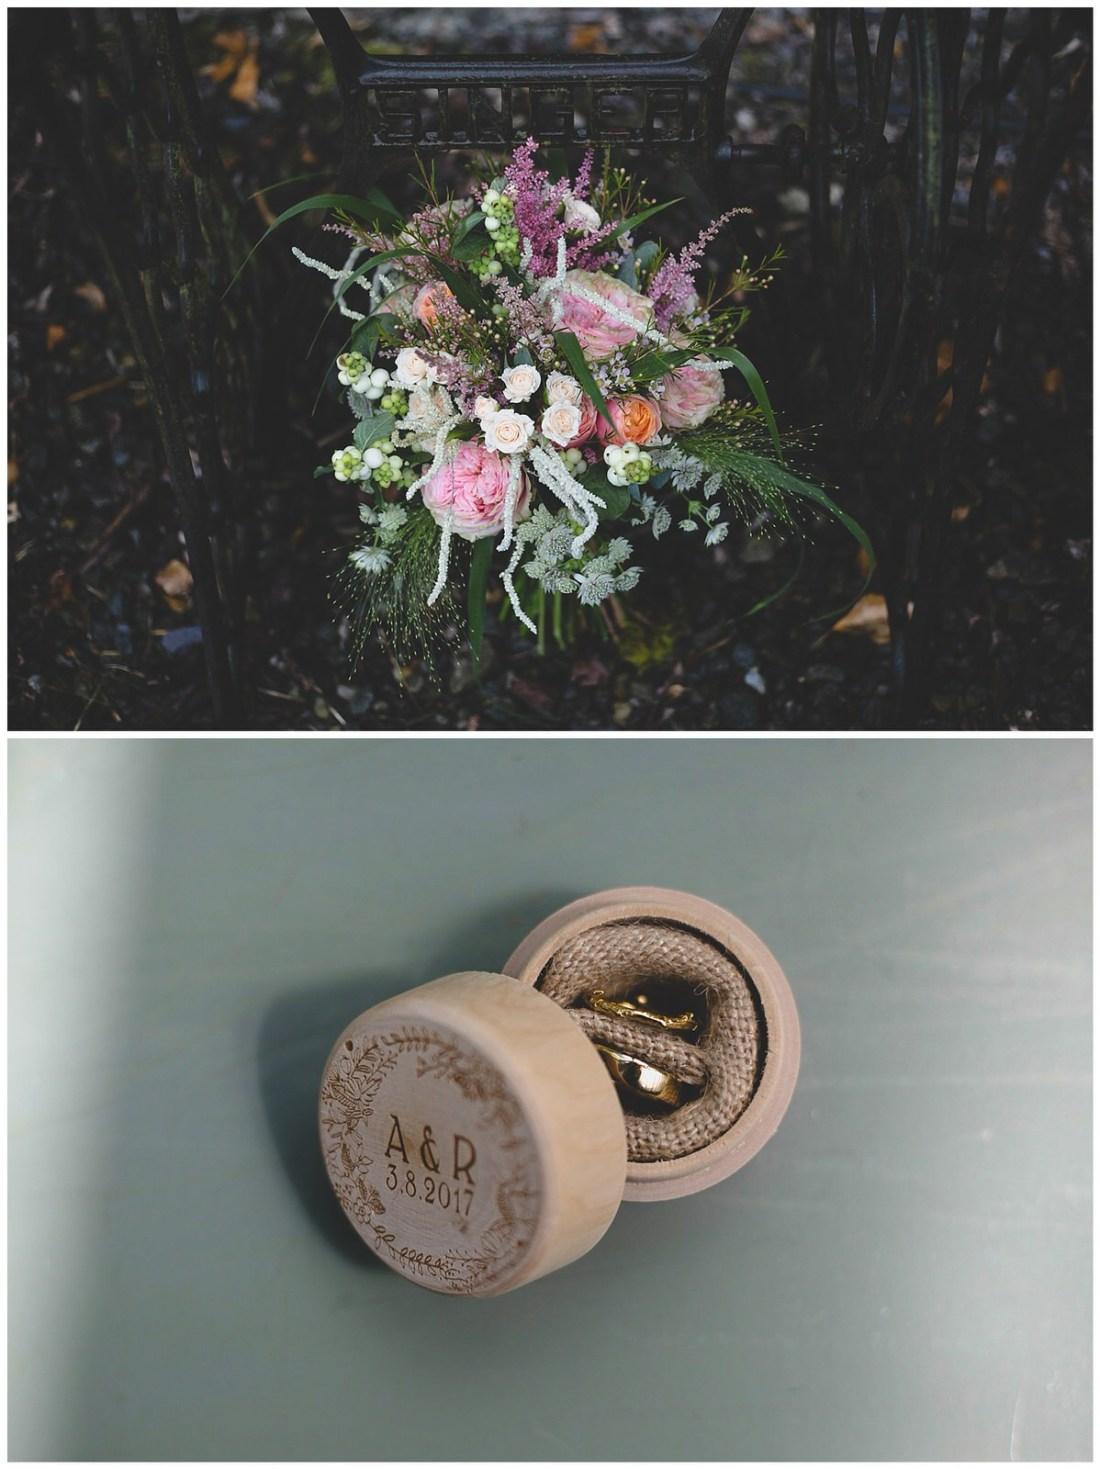 Circular brown wooden ring box